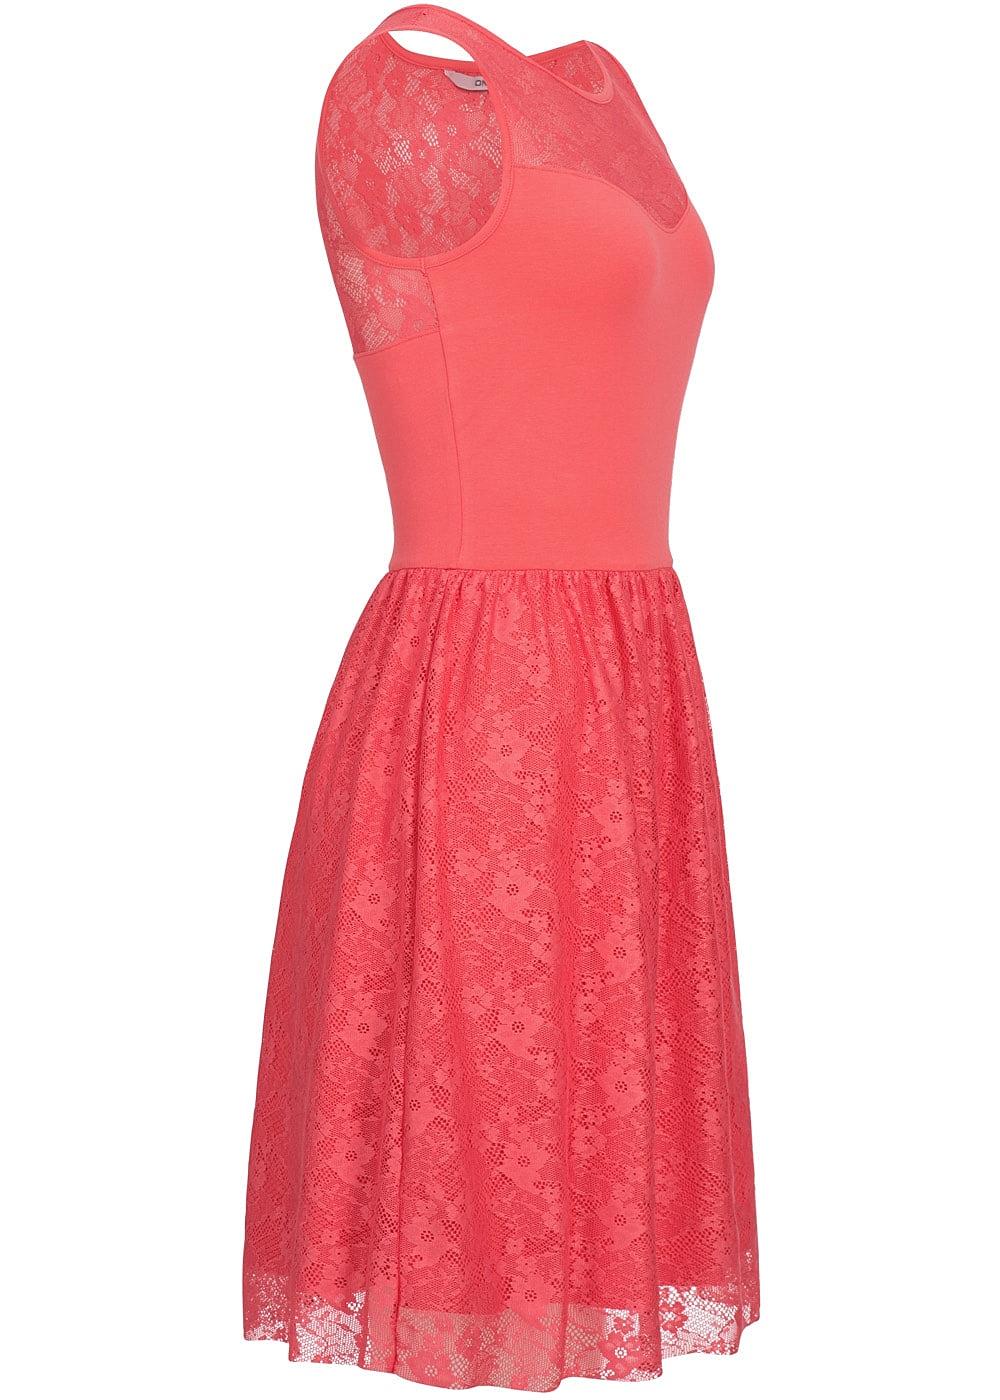 77 Online Shop De : only damen midi kleid 2 lagig spitze rose of sharon coral 77onlineshop ~ Markanthonyermac.com Haus und Dekorationen